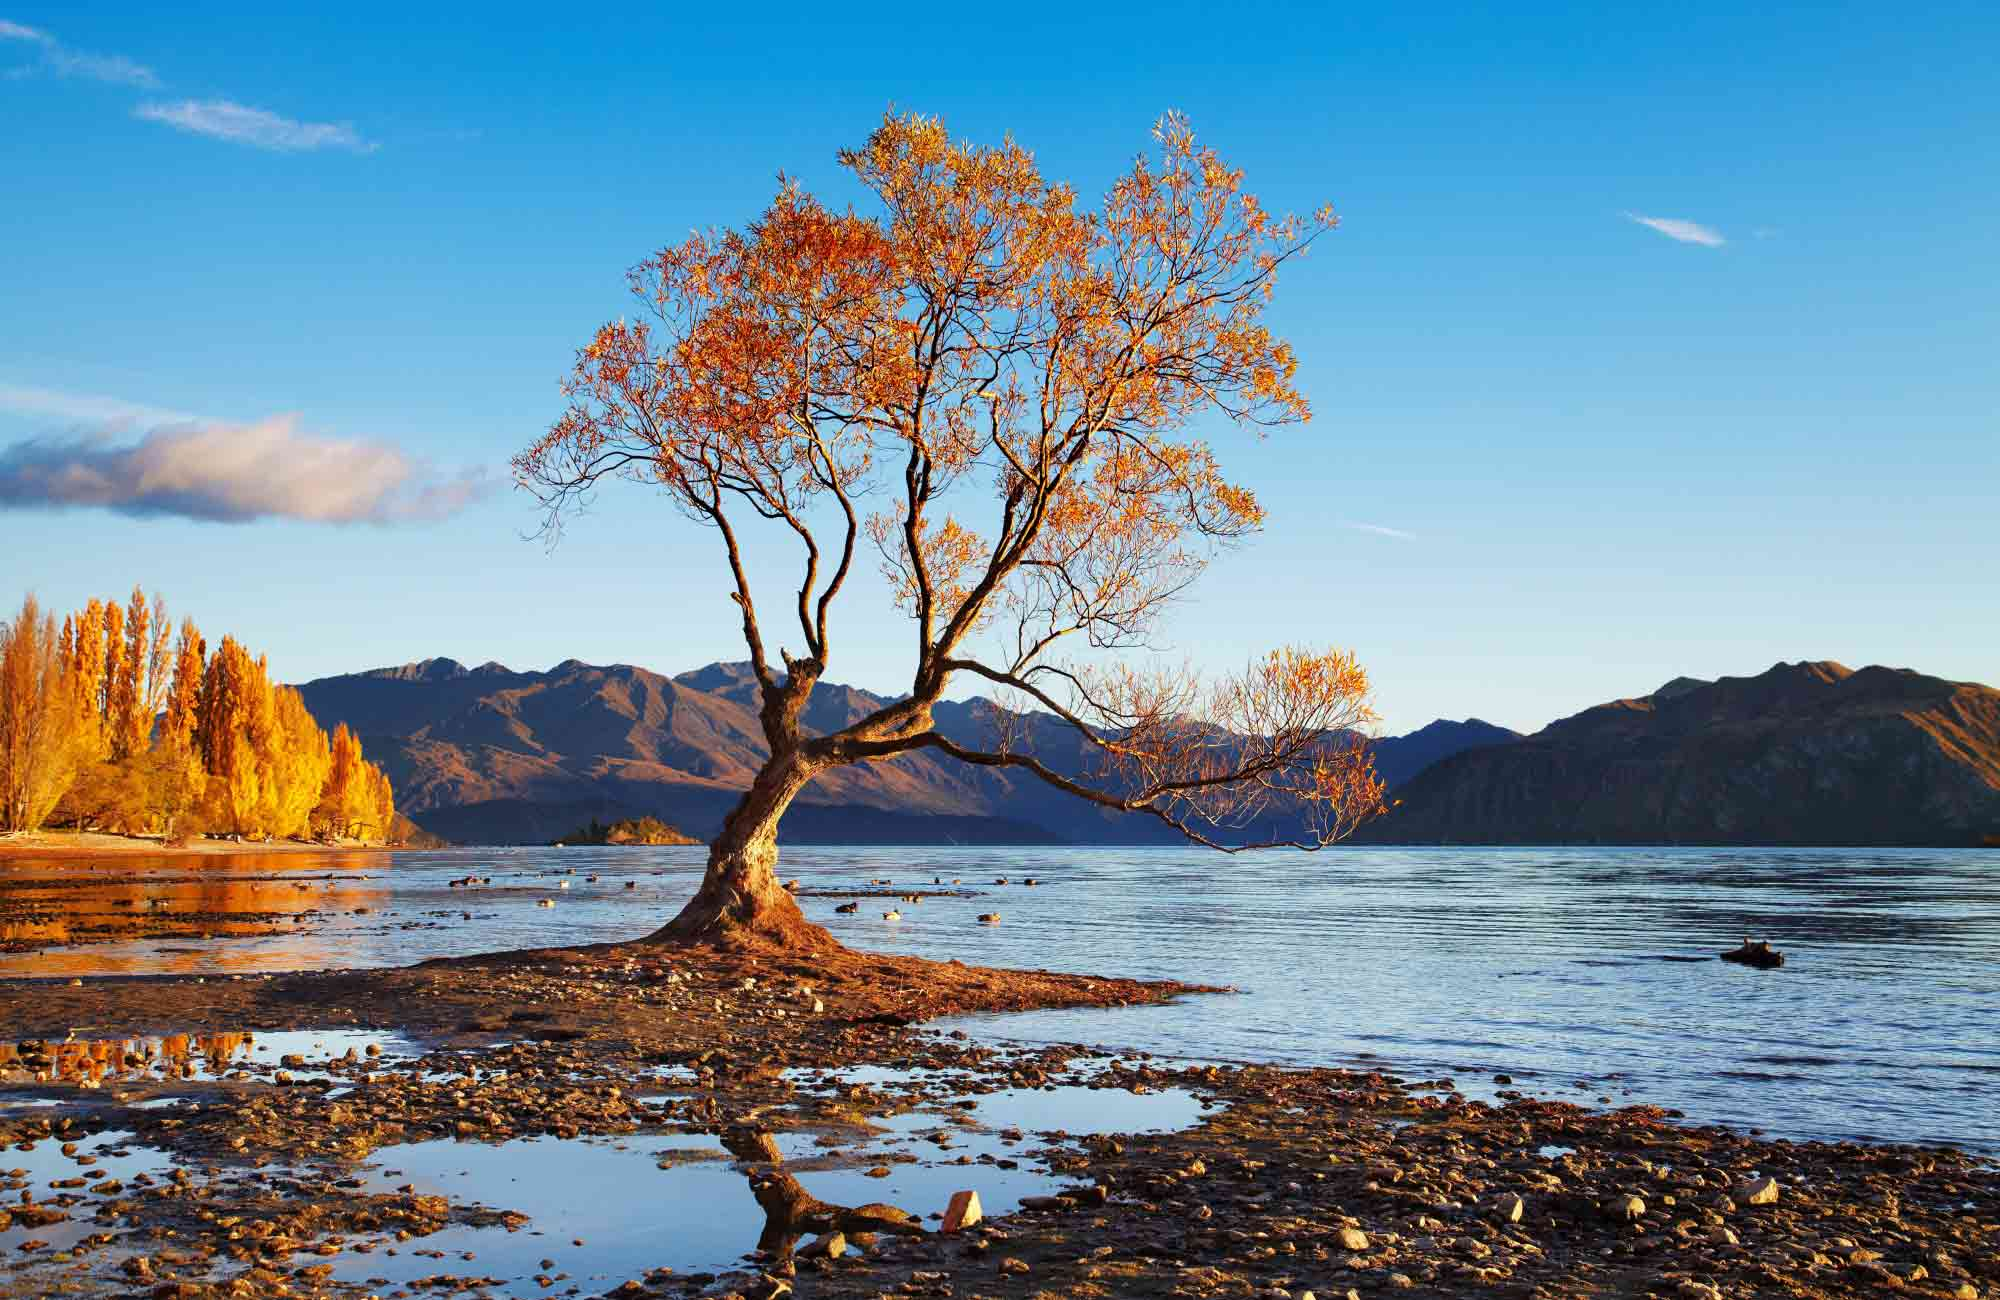 L'arbre solitaire du lac Wanaka